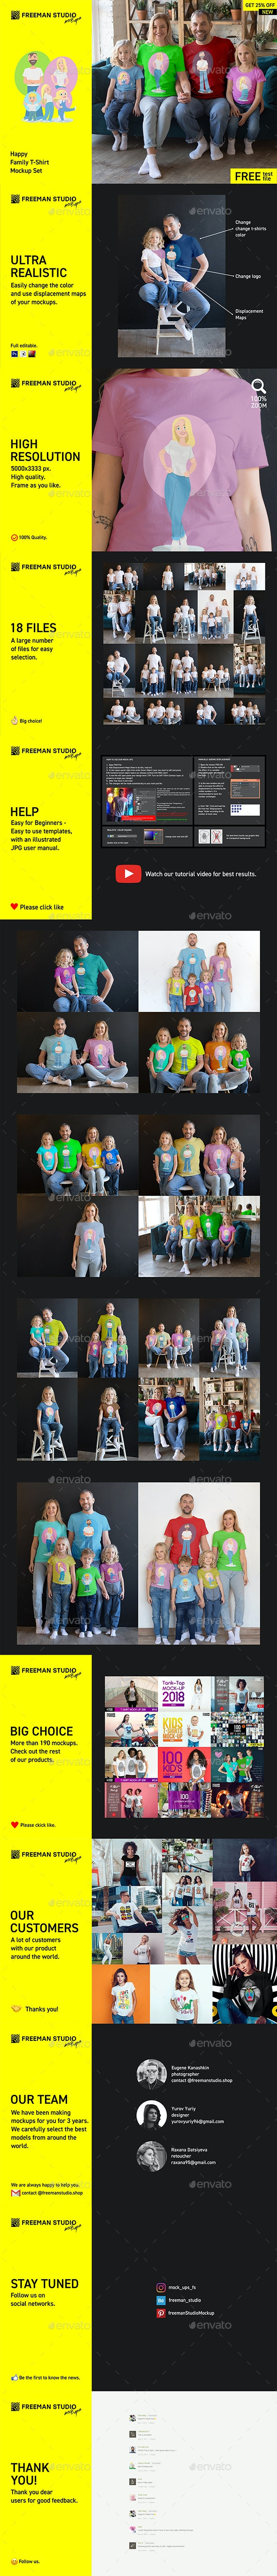 Happy Family T-Shirt Mock-Up Set - Product Mock-Ups Graphics